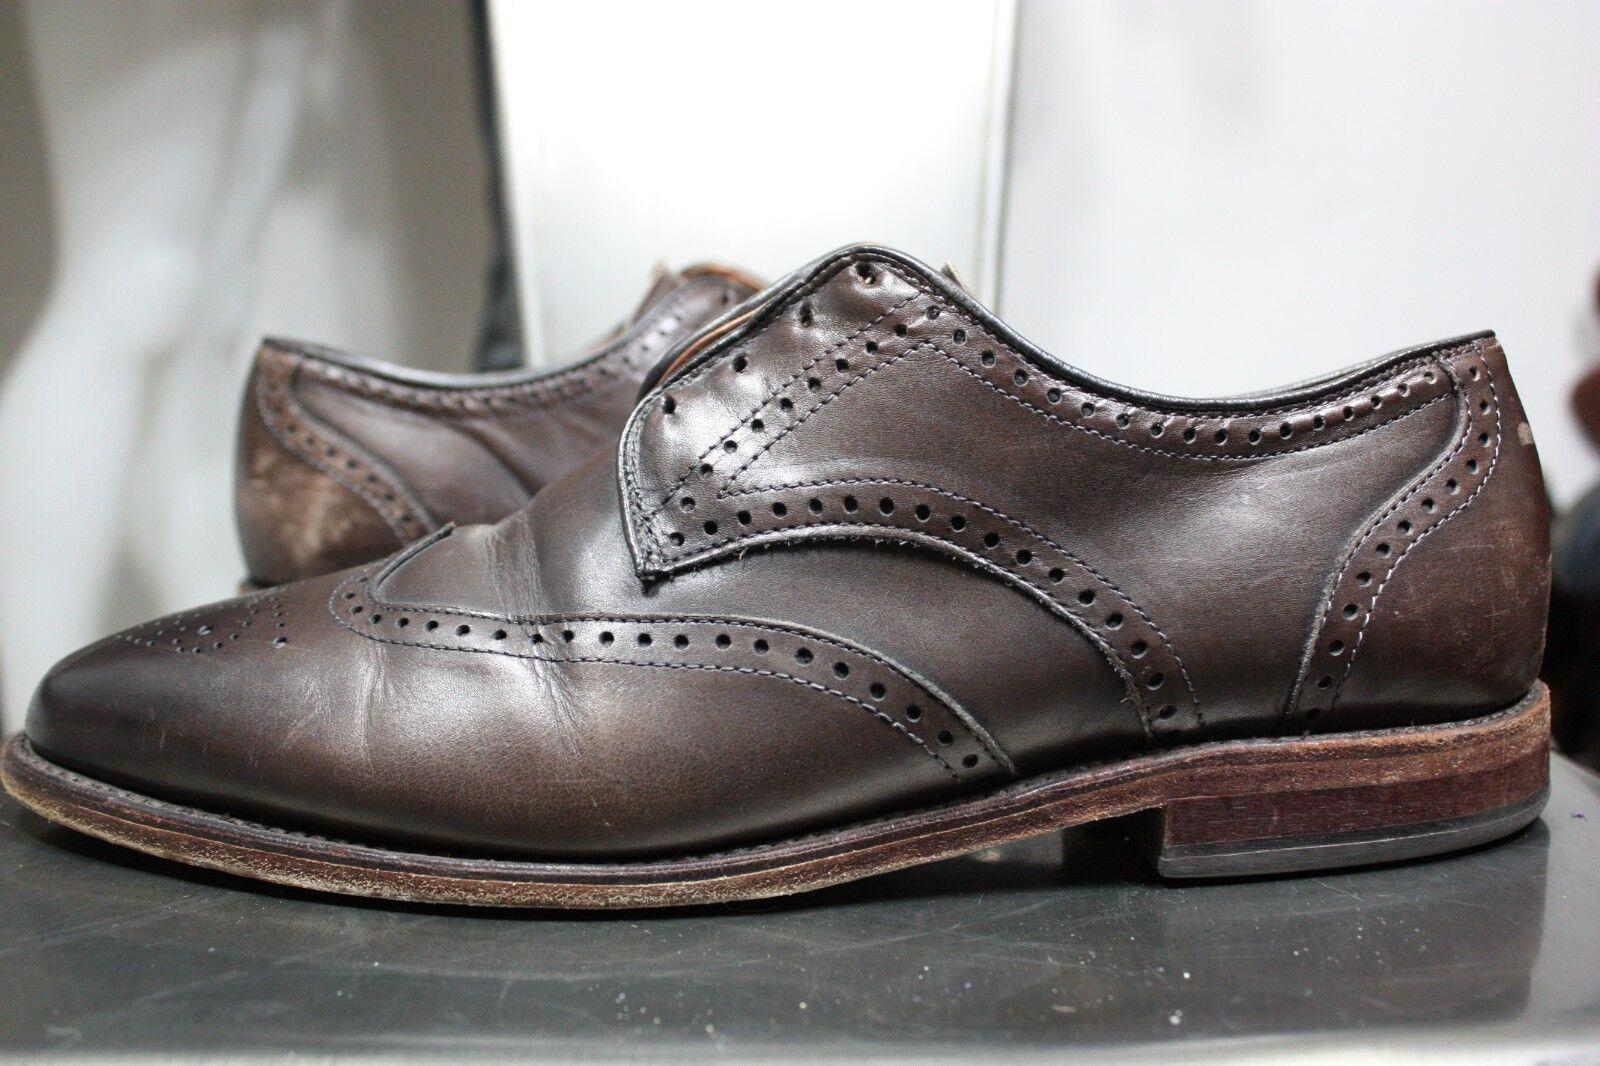 prezzi più convenienti Allen Edmonds Edmonds Edmonds Hinsdale scarpe 10.5 D wing-tip oxfords Marrone leather made in USA  promozioni eccitanti